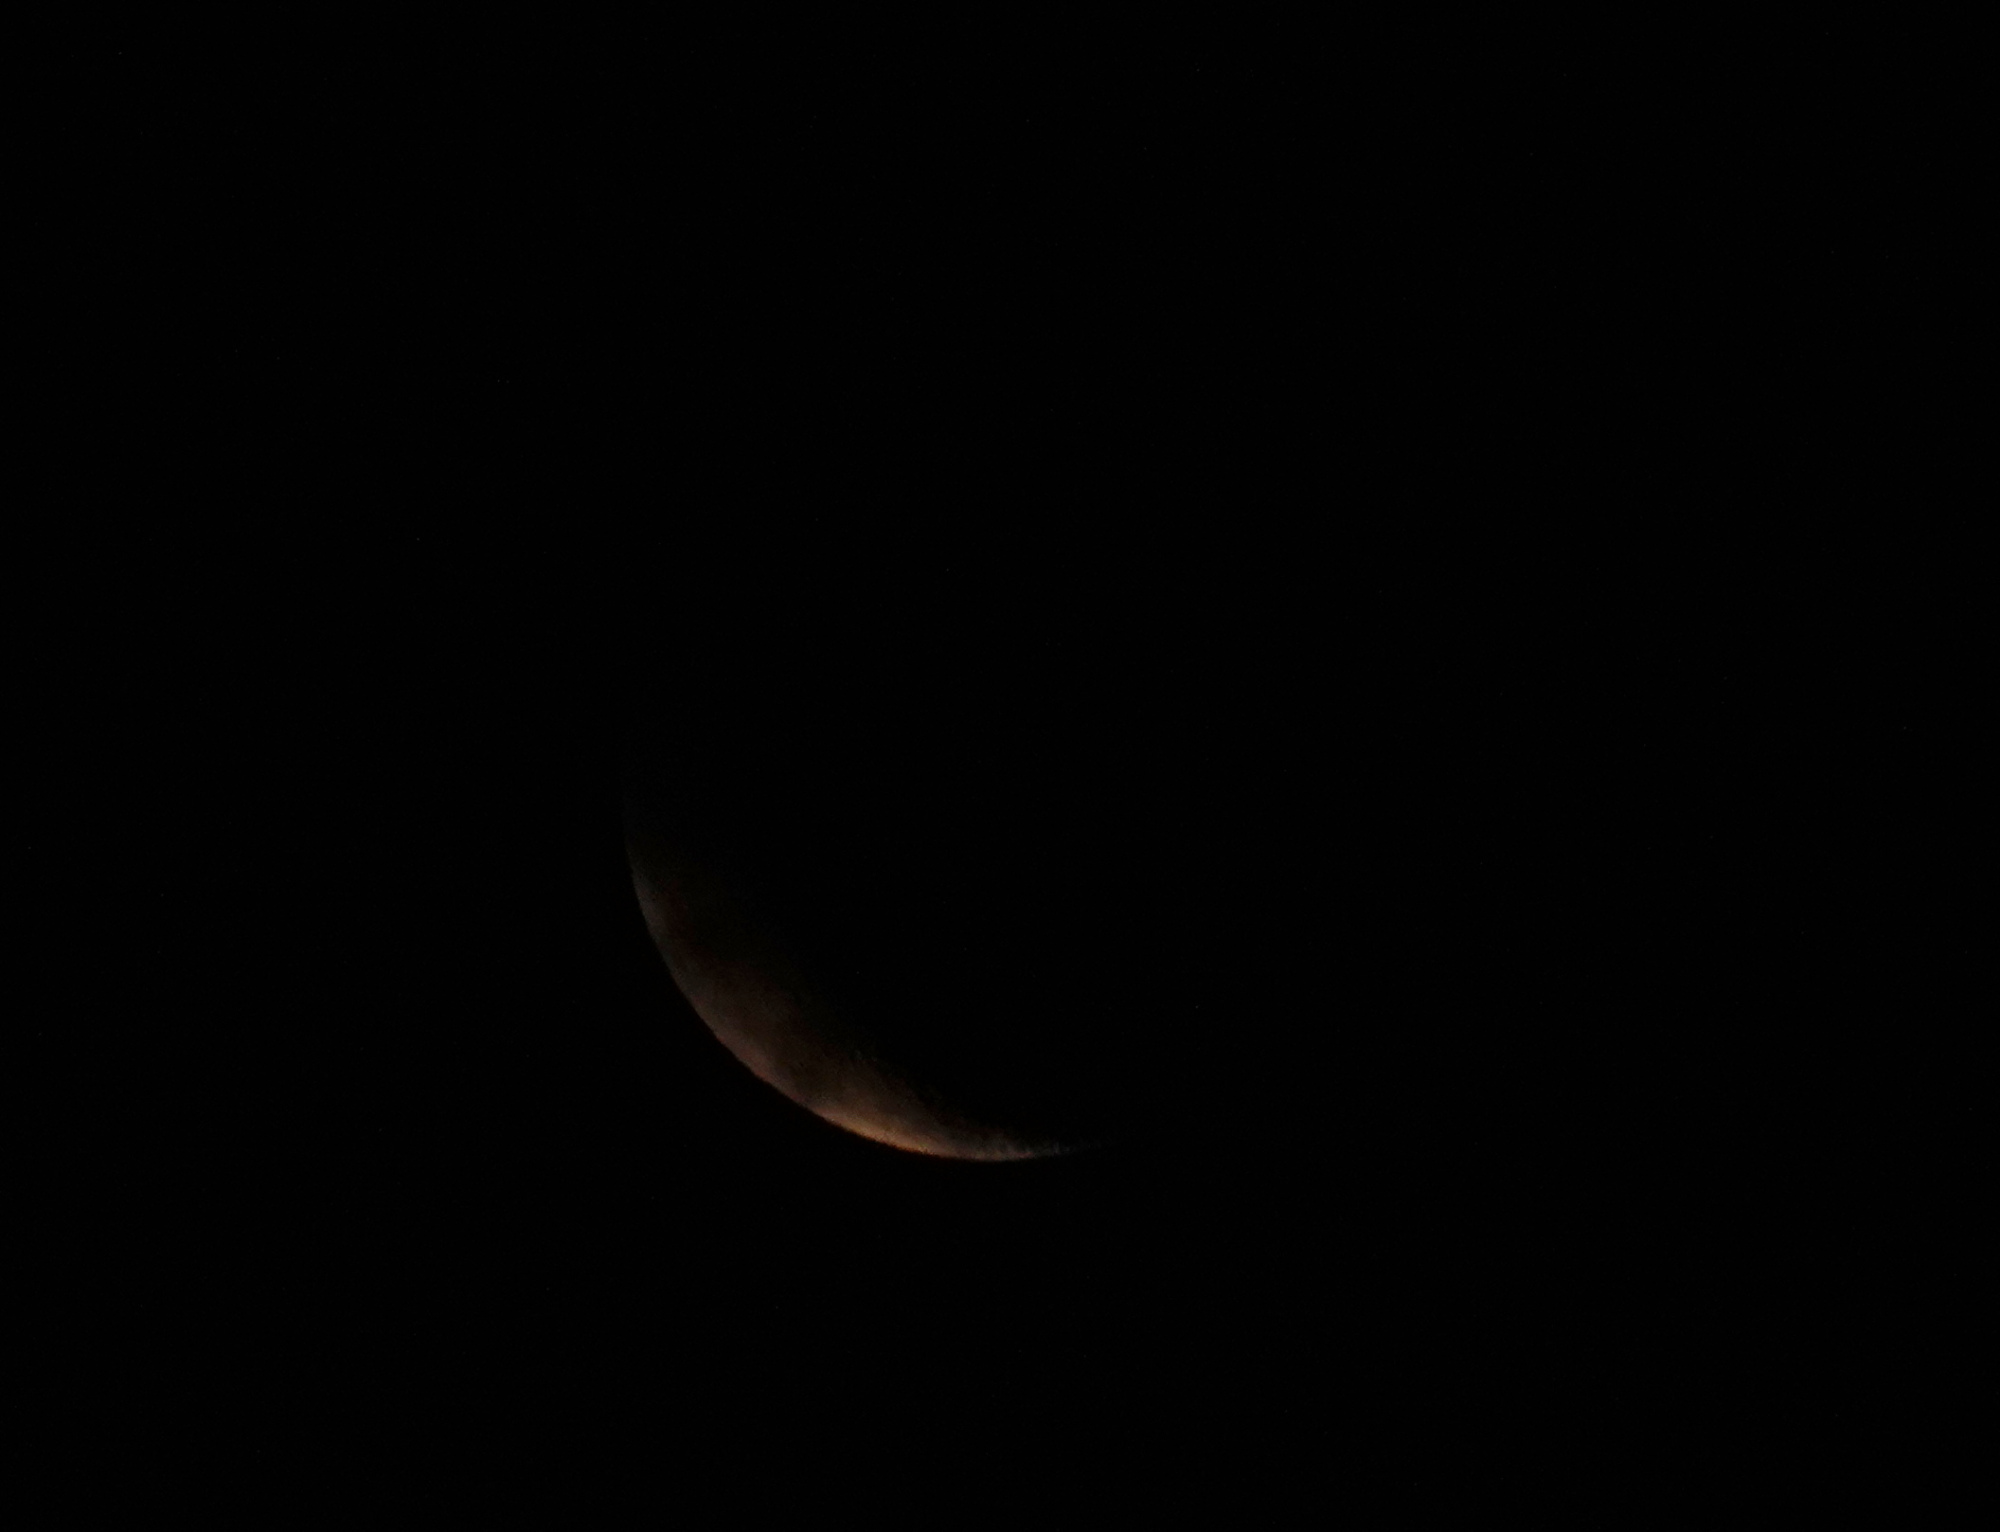 lune3.thumb.JPG.f65aae49d52afb2df437c6017c28a8f5.JPG